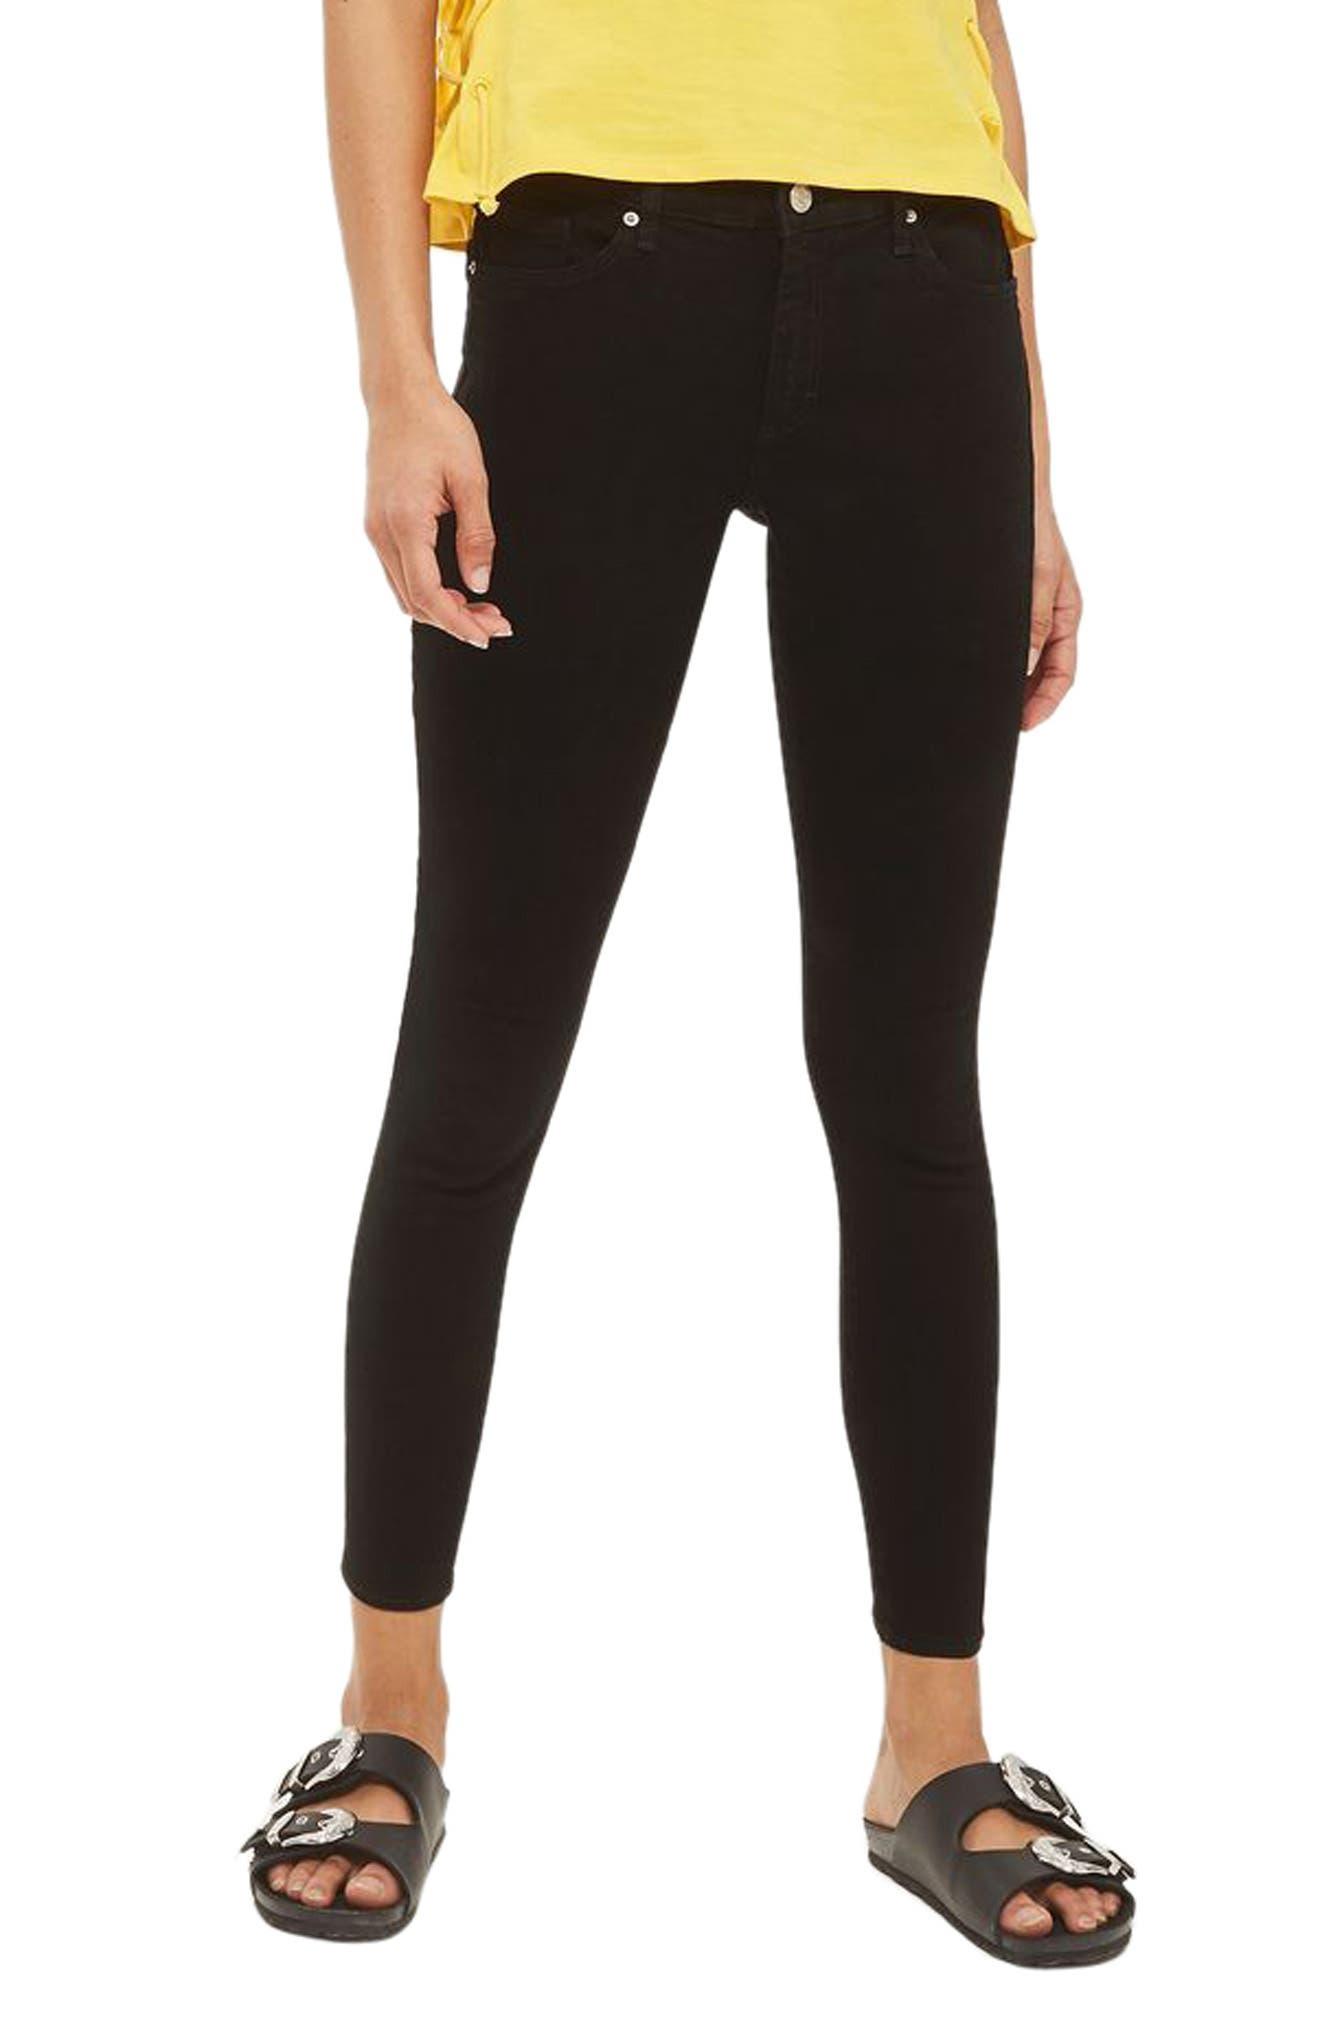 Topshop Sidney Skinny Jeans (Petite)